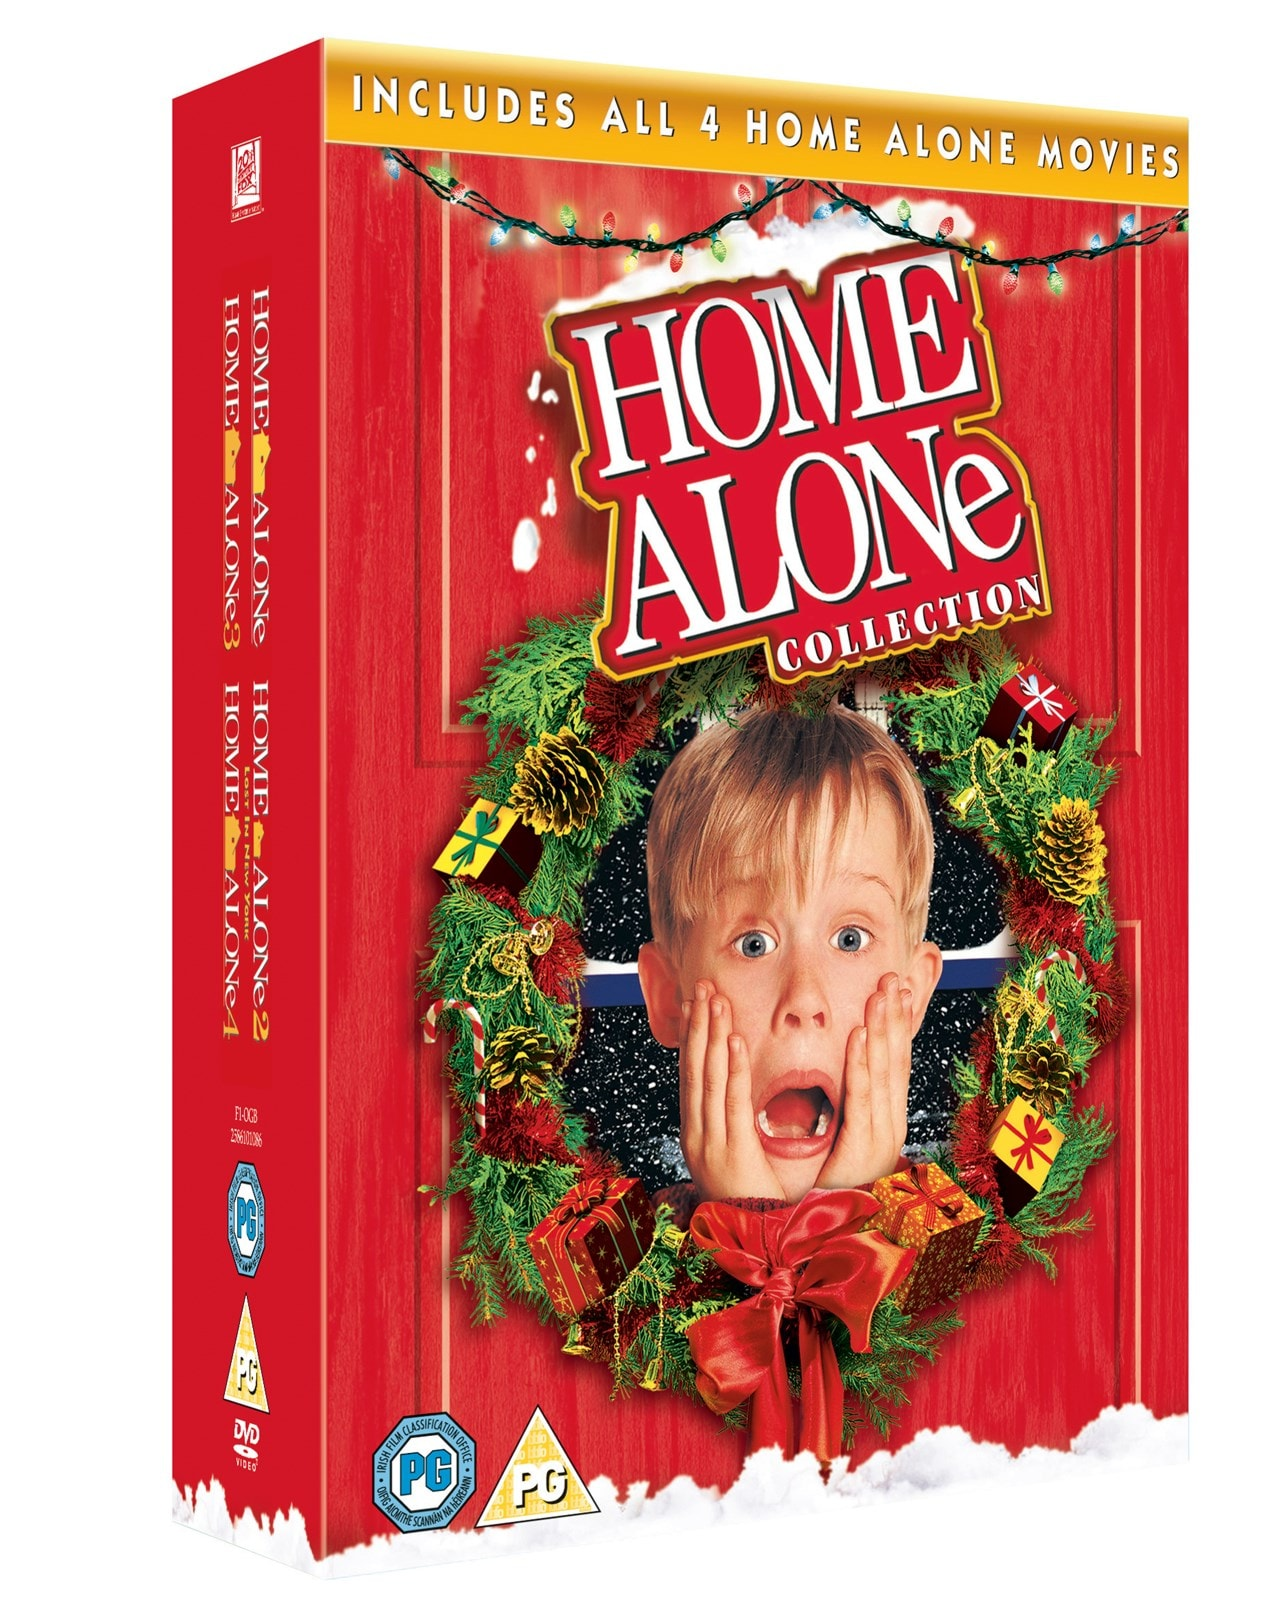 Home Alone/Home Alone 2 /Home Alone 3/Home Alone 4 - 2